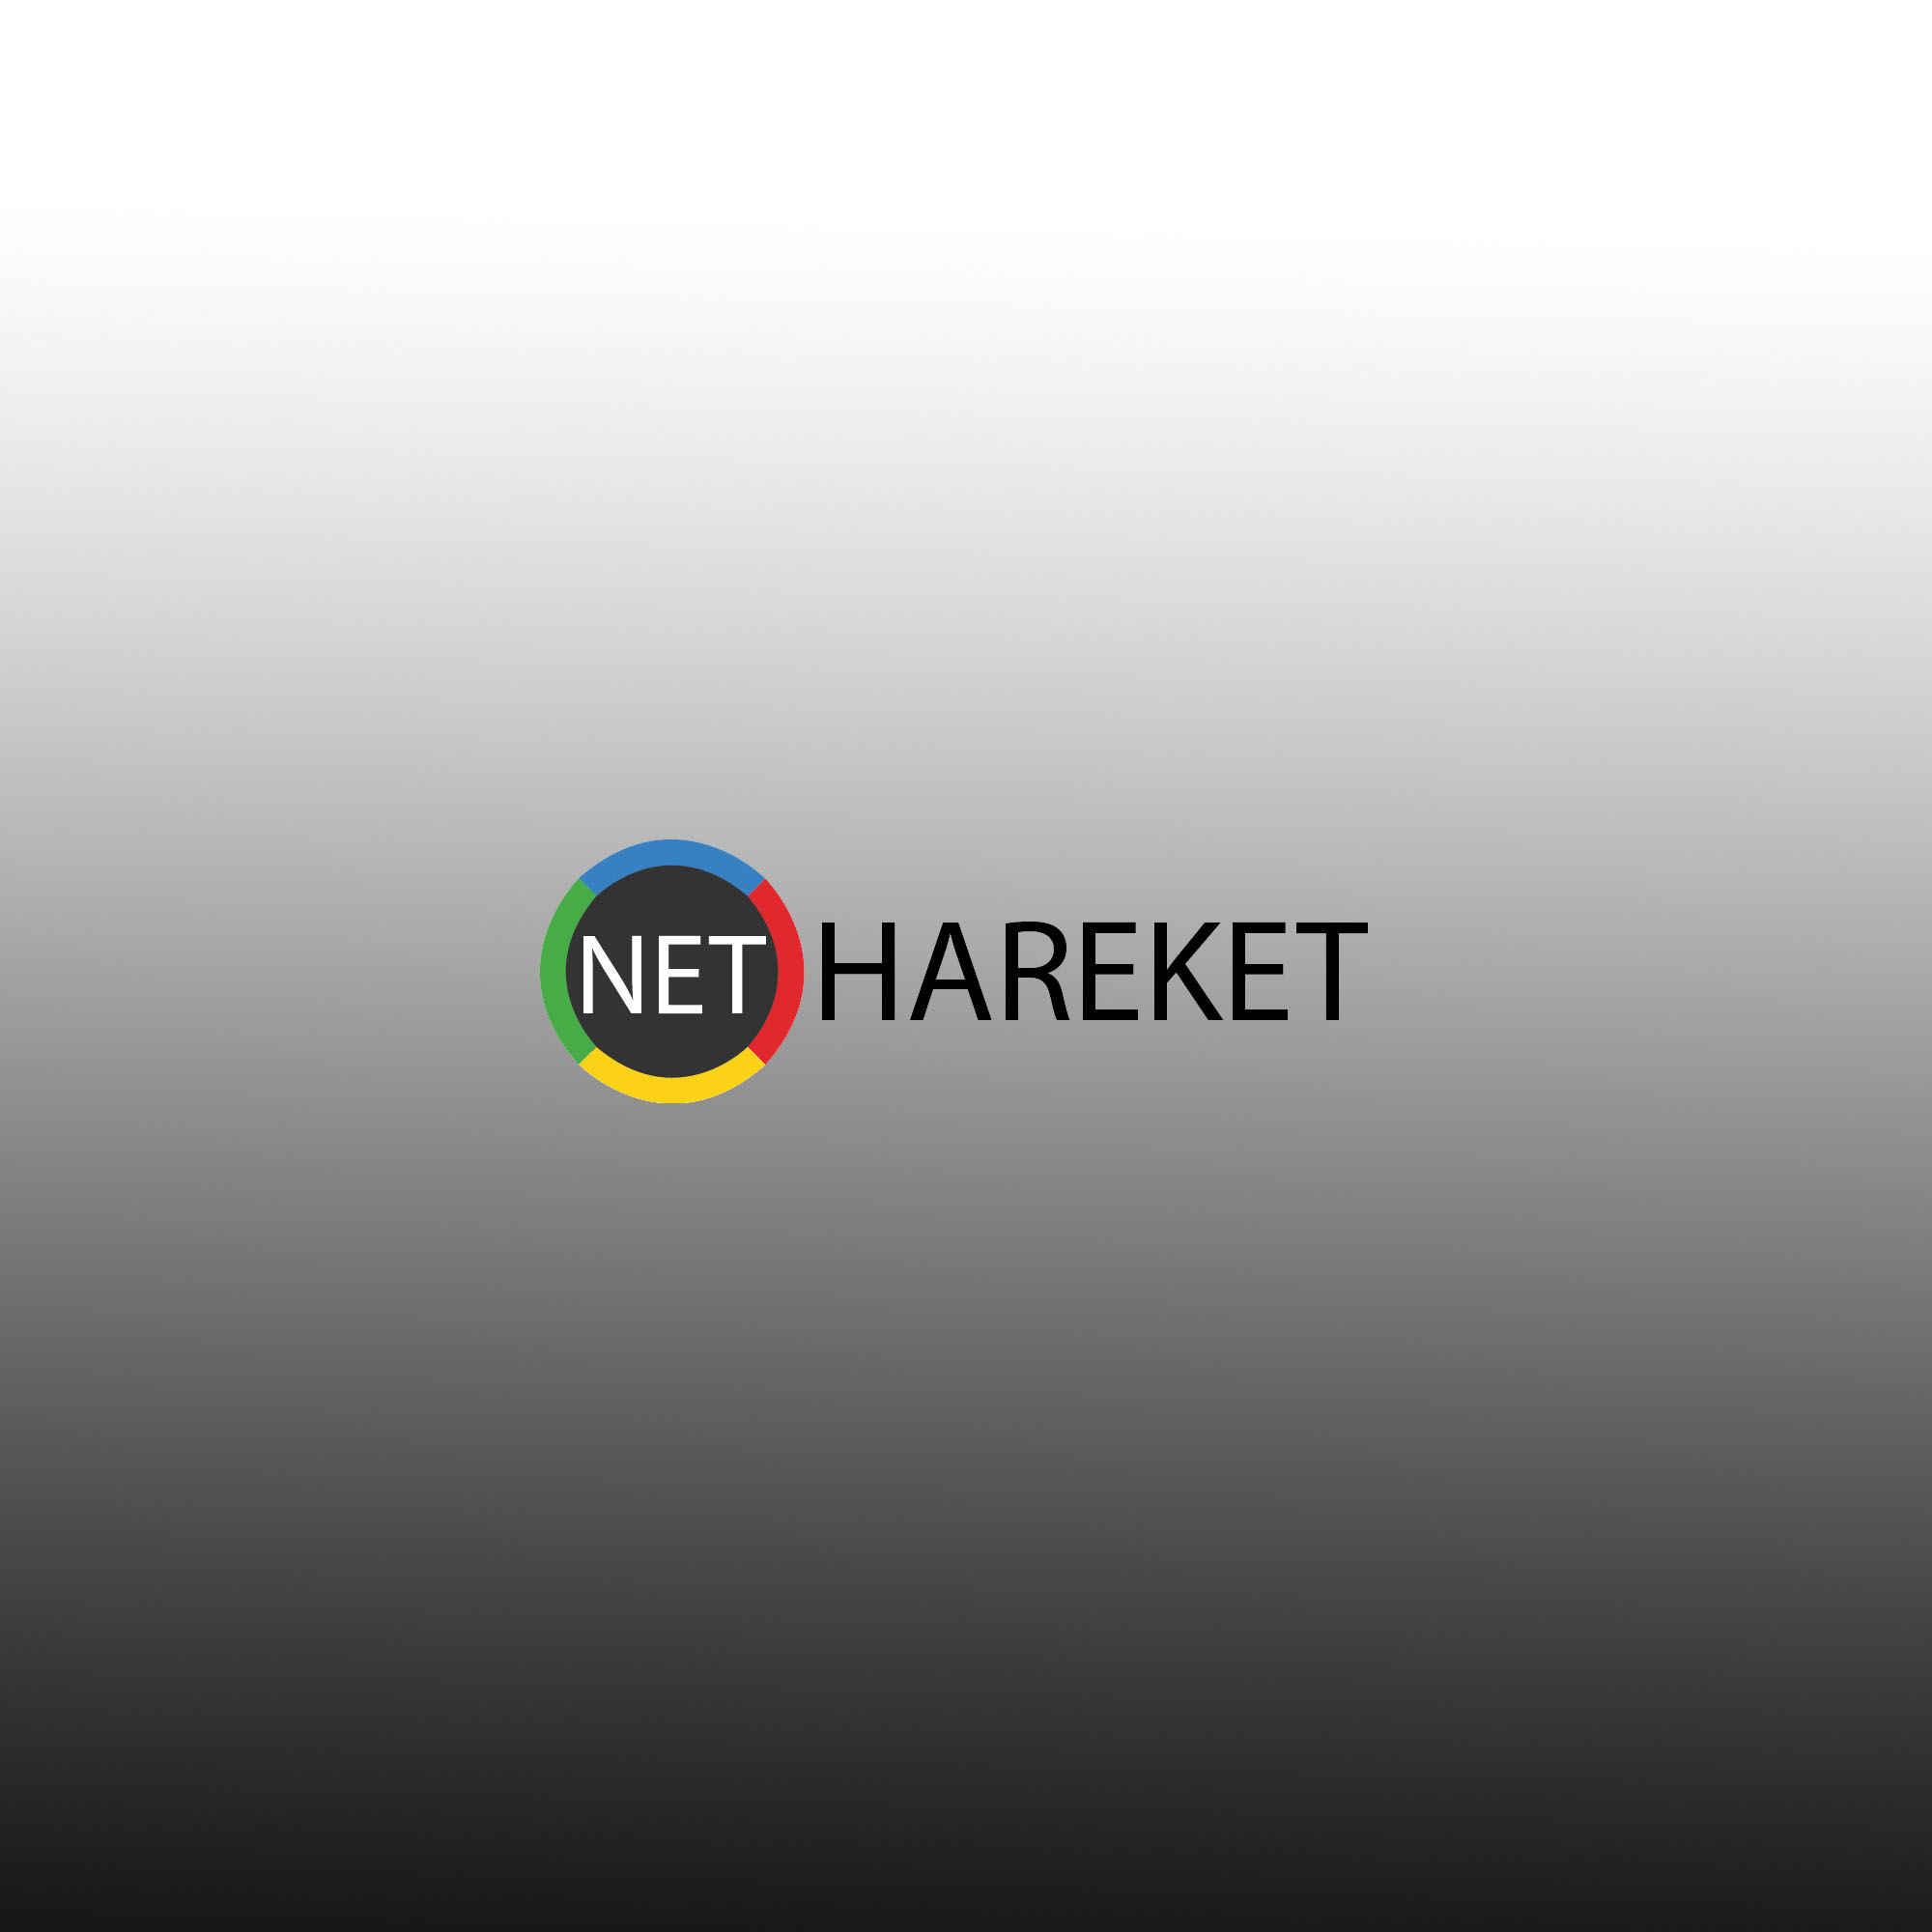 Net Hareket banner fotograf